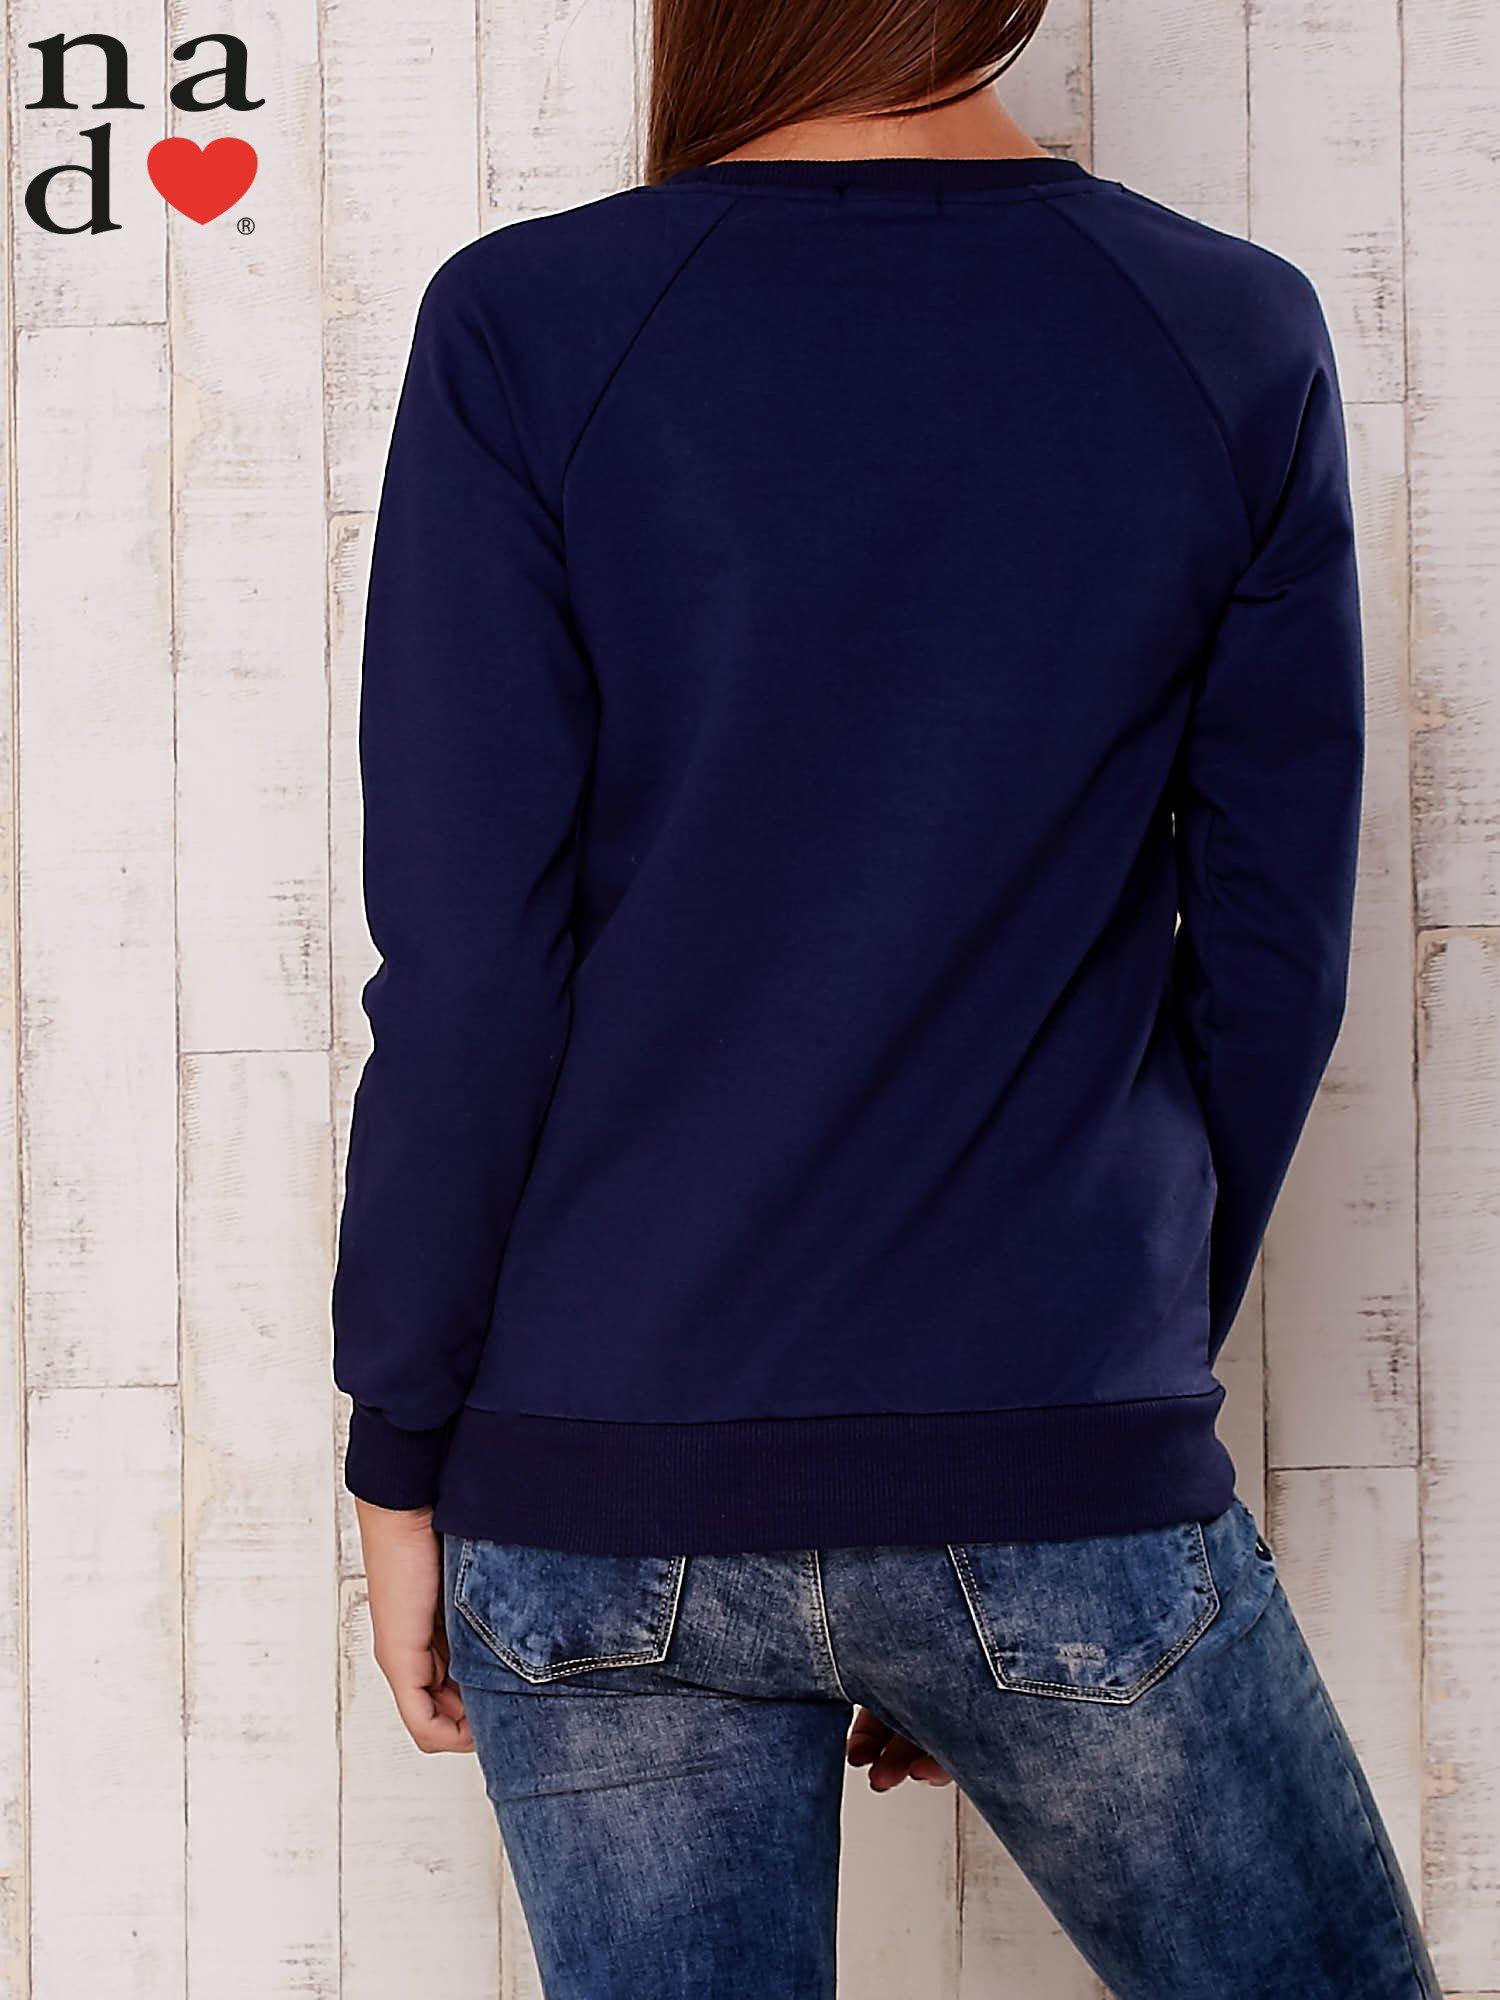 Ciemnoniebieska bluza z nadrukiem serca                                  zdj.                                  4